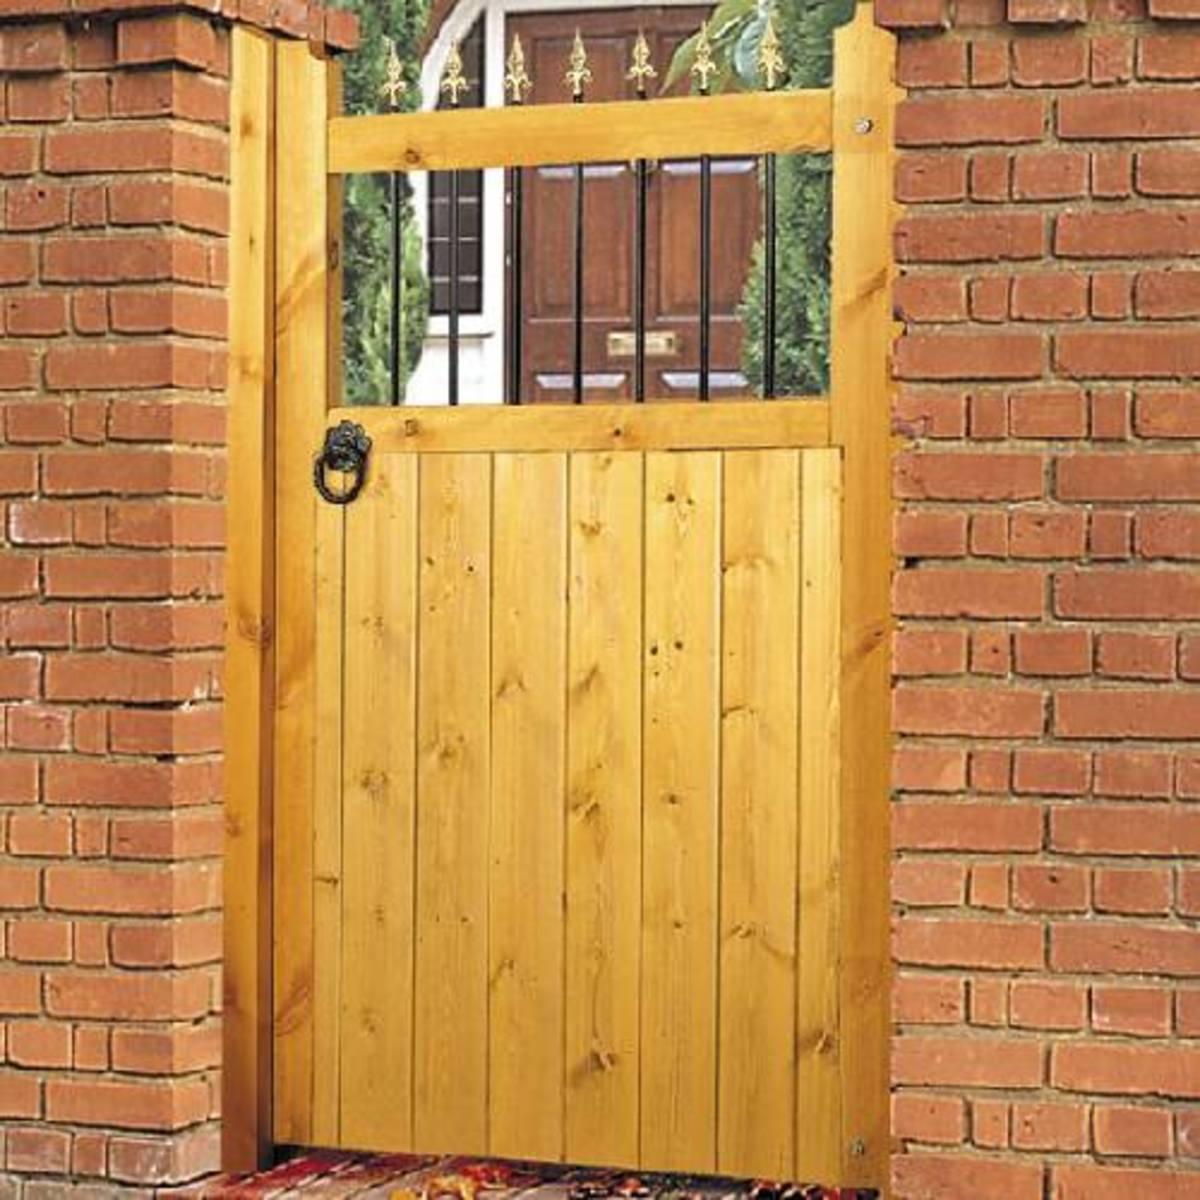 Wooden gates - Tall single side entrance wooden gates - Vertifleur side gate